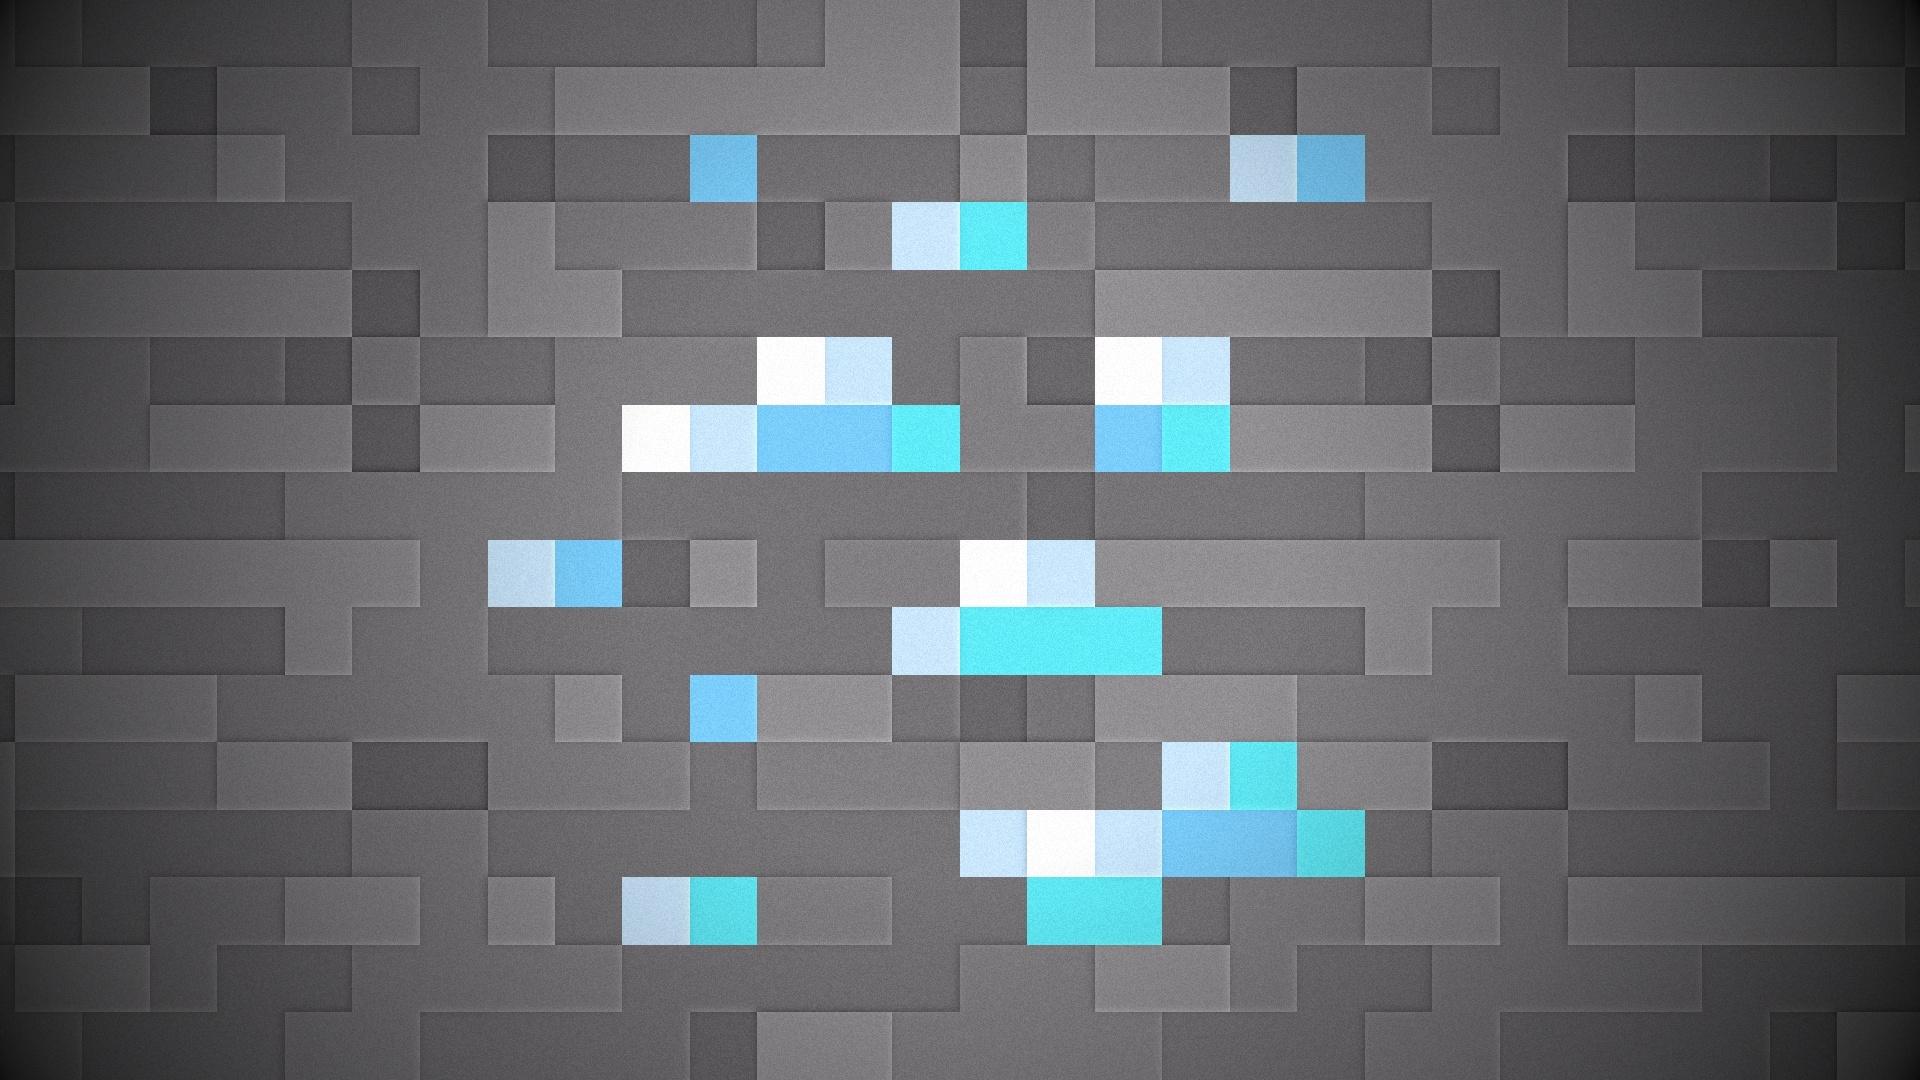 free minecraft mac wallpapers, imac wallpapers, retina macbook pro